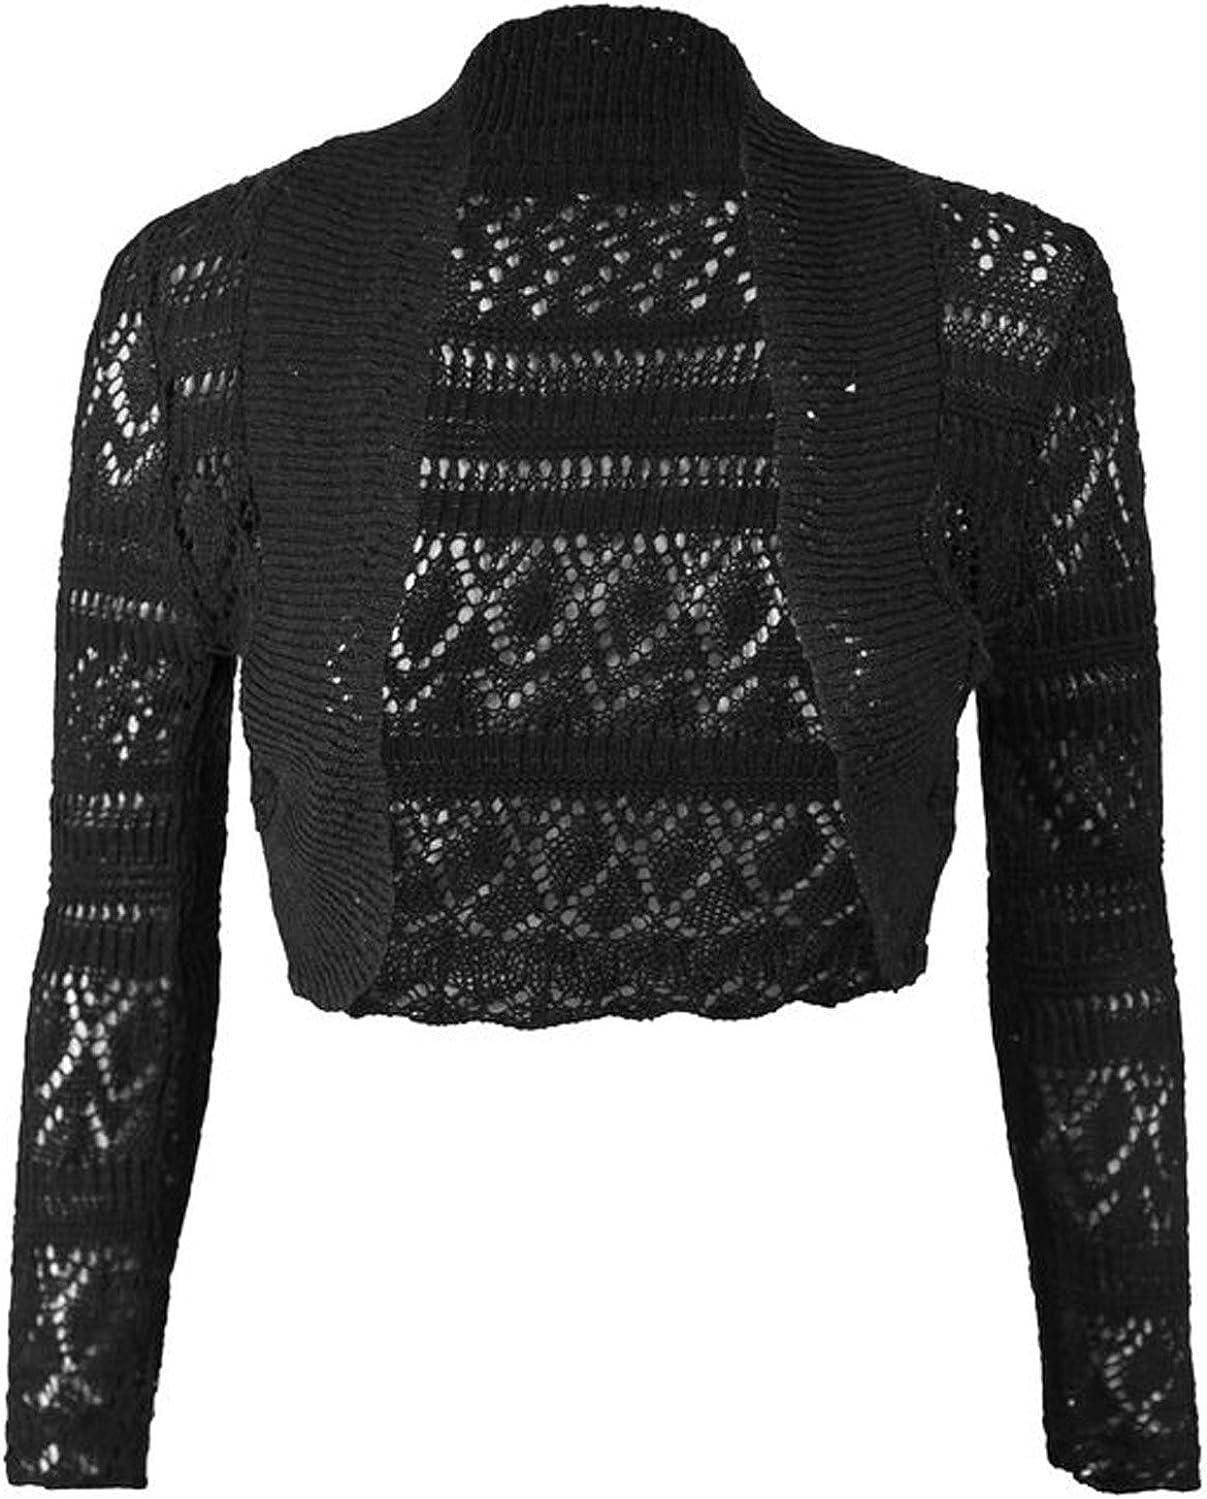 FashionMark Womens Shrug Bolero Knitted Crochet Cropped Open Shrug Top